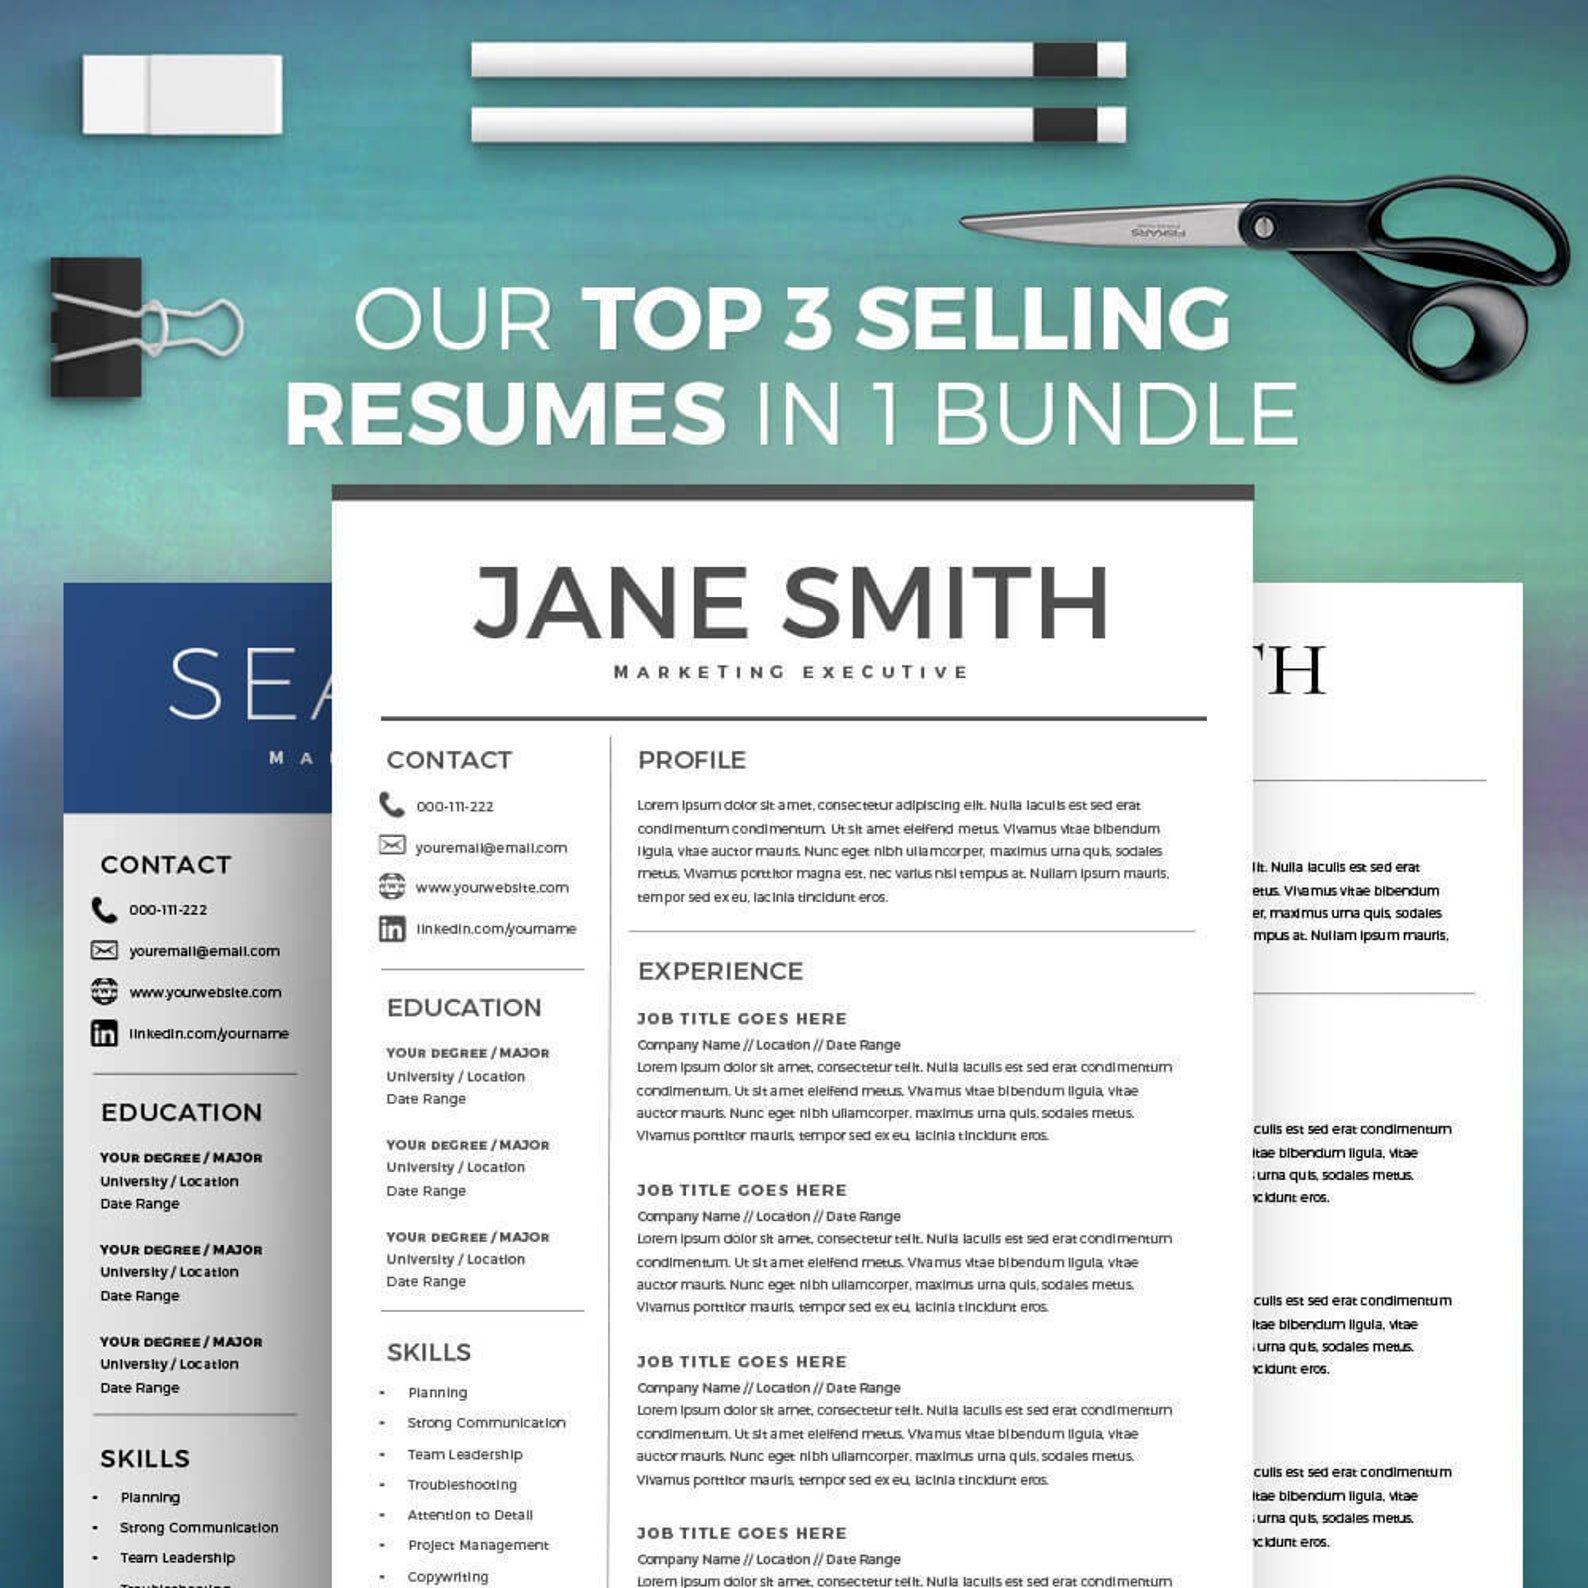 Resume Templates Bundle Of 3 Best Resume Templates Easy Resume Template Bundle With Cover Letter Minimalist Resume Instant Download Best Resume Template Resume Templates Simple Resume Template